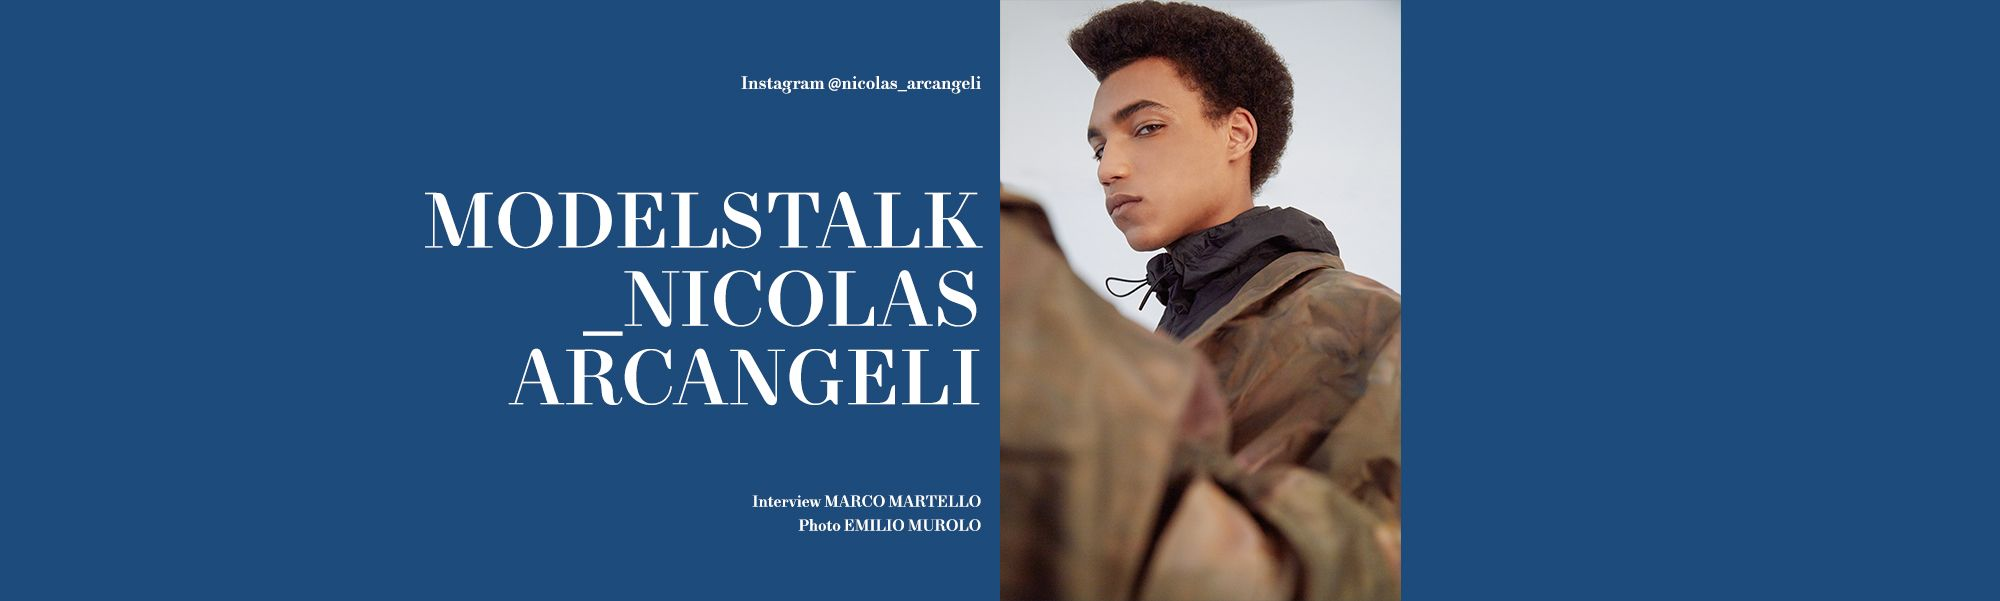 nicolas-arcangeli-thegreatestmagazine-banner